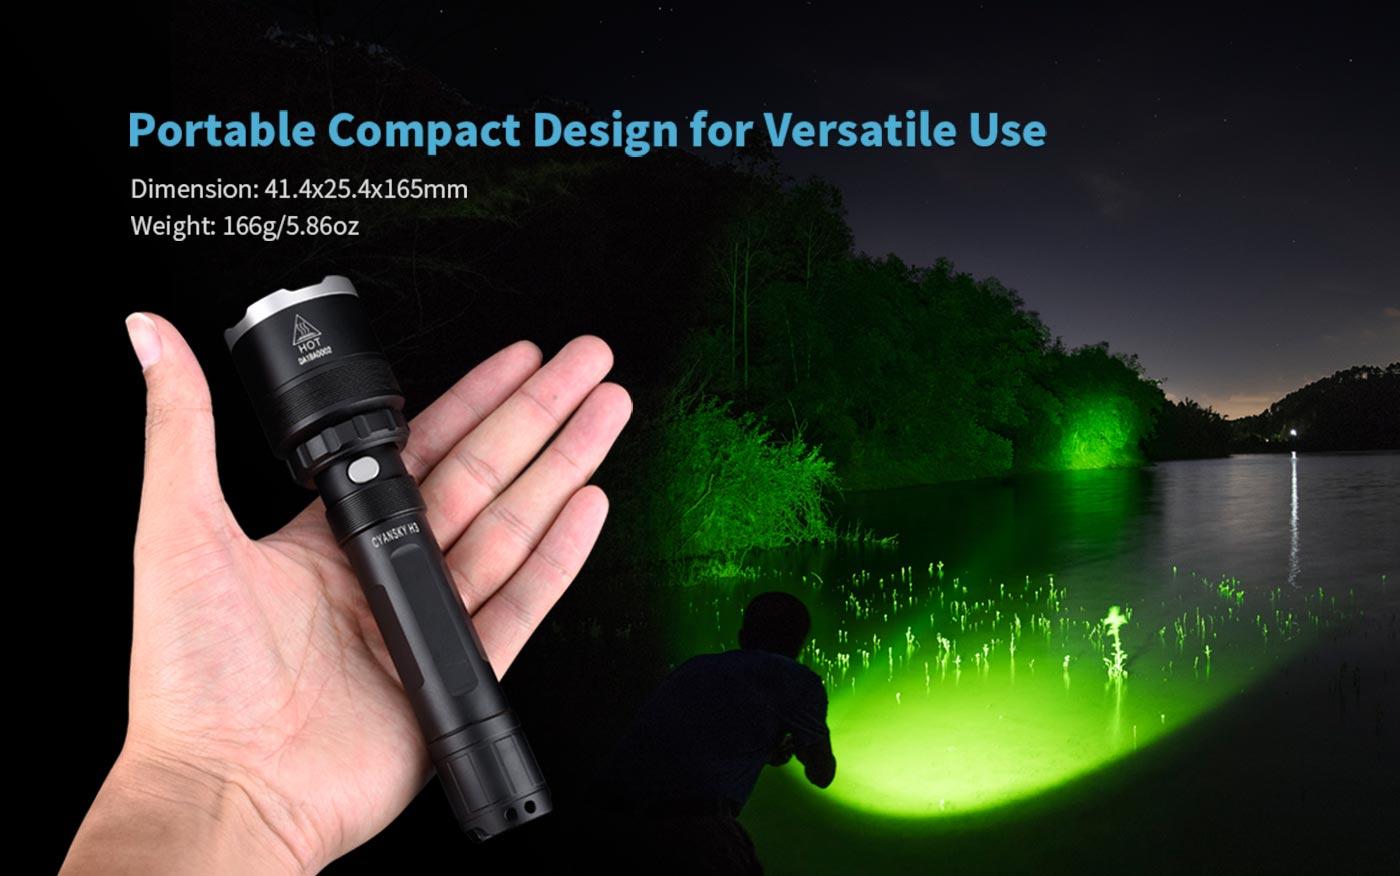 Campact hunting torch, hunting flashlight torch, portable hunting torch